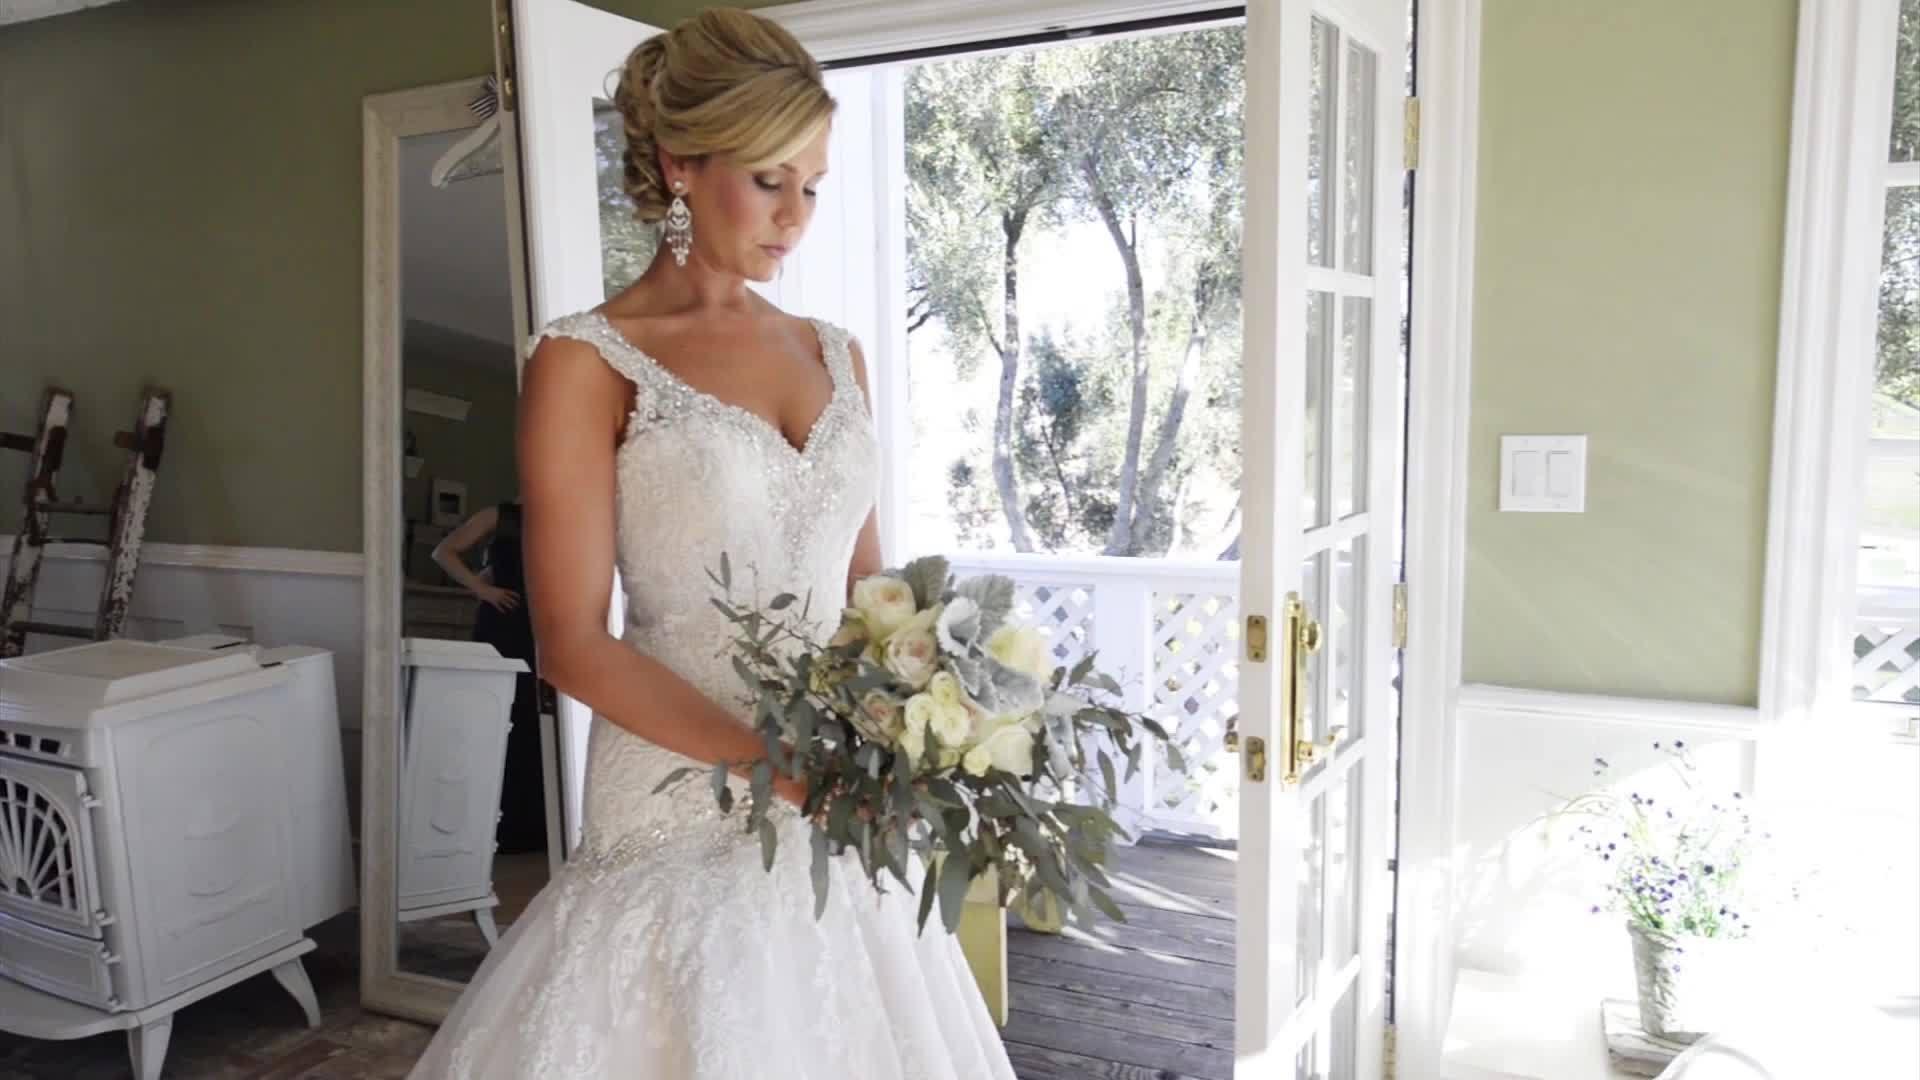 trifocus-media-san-francisco-wedding-videography GIFs